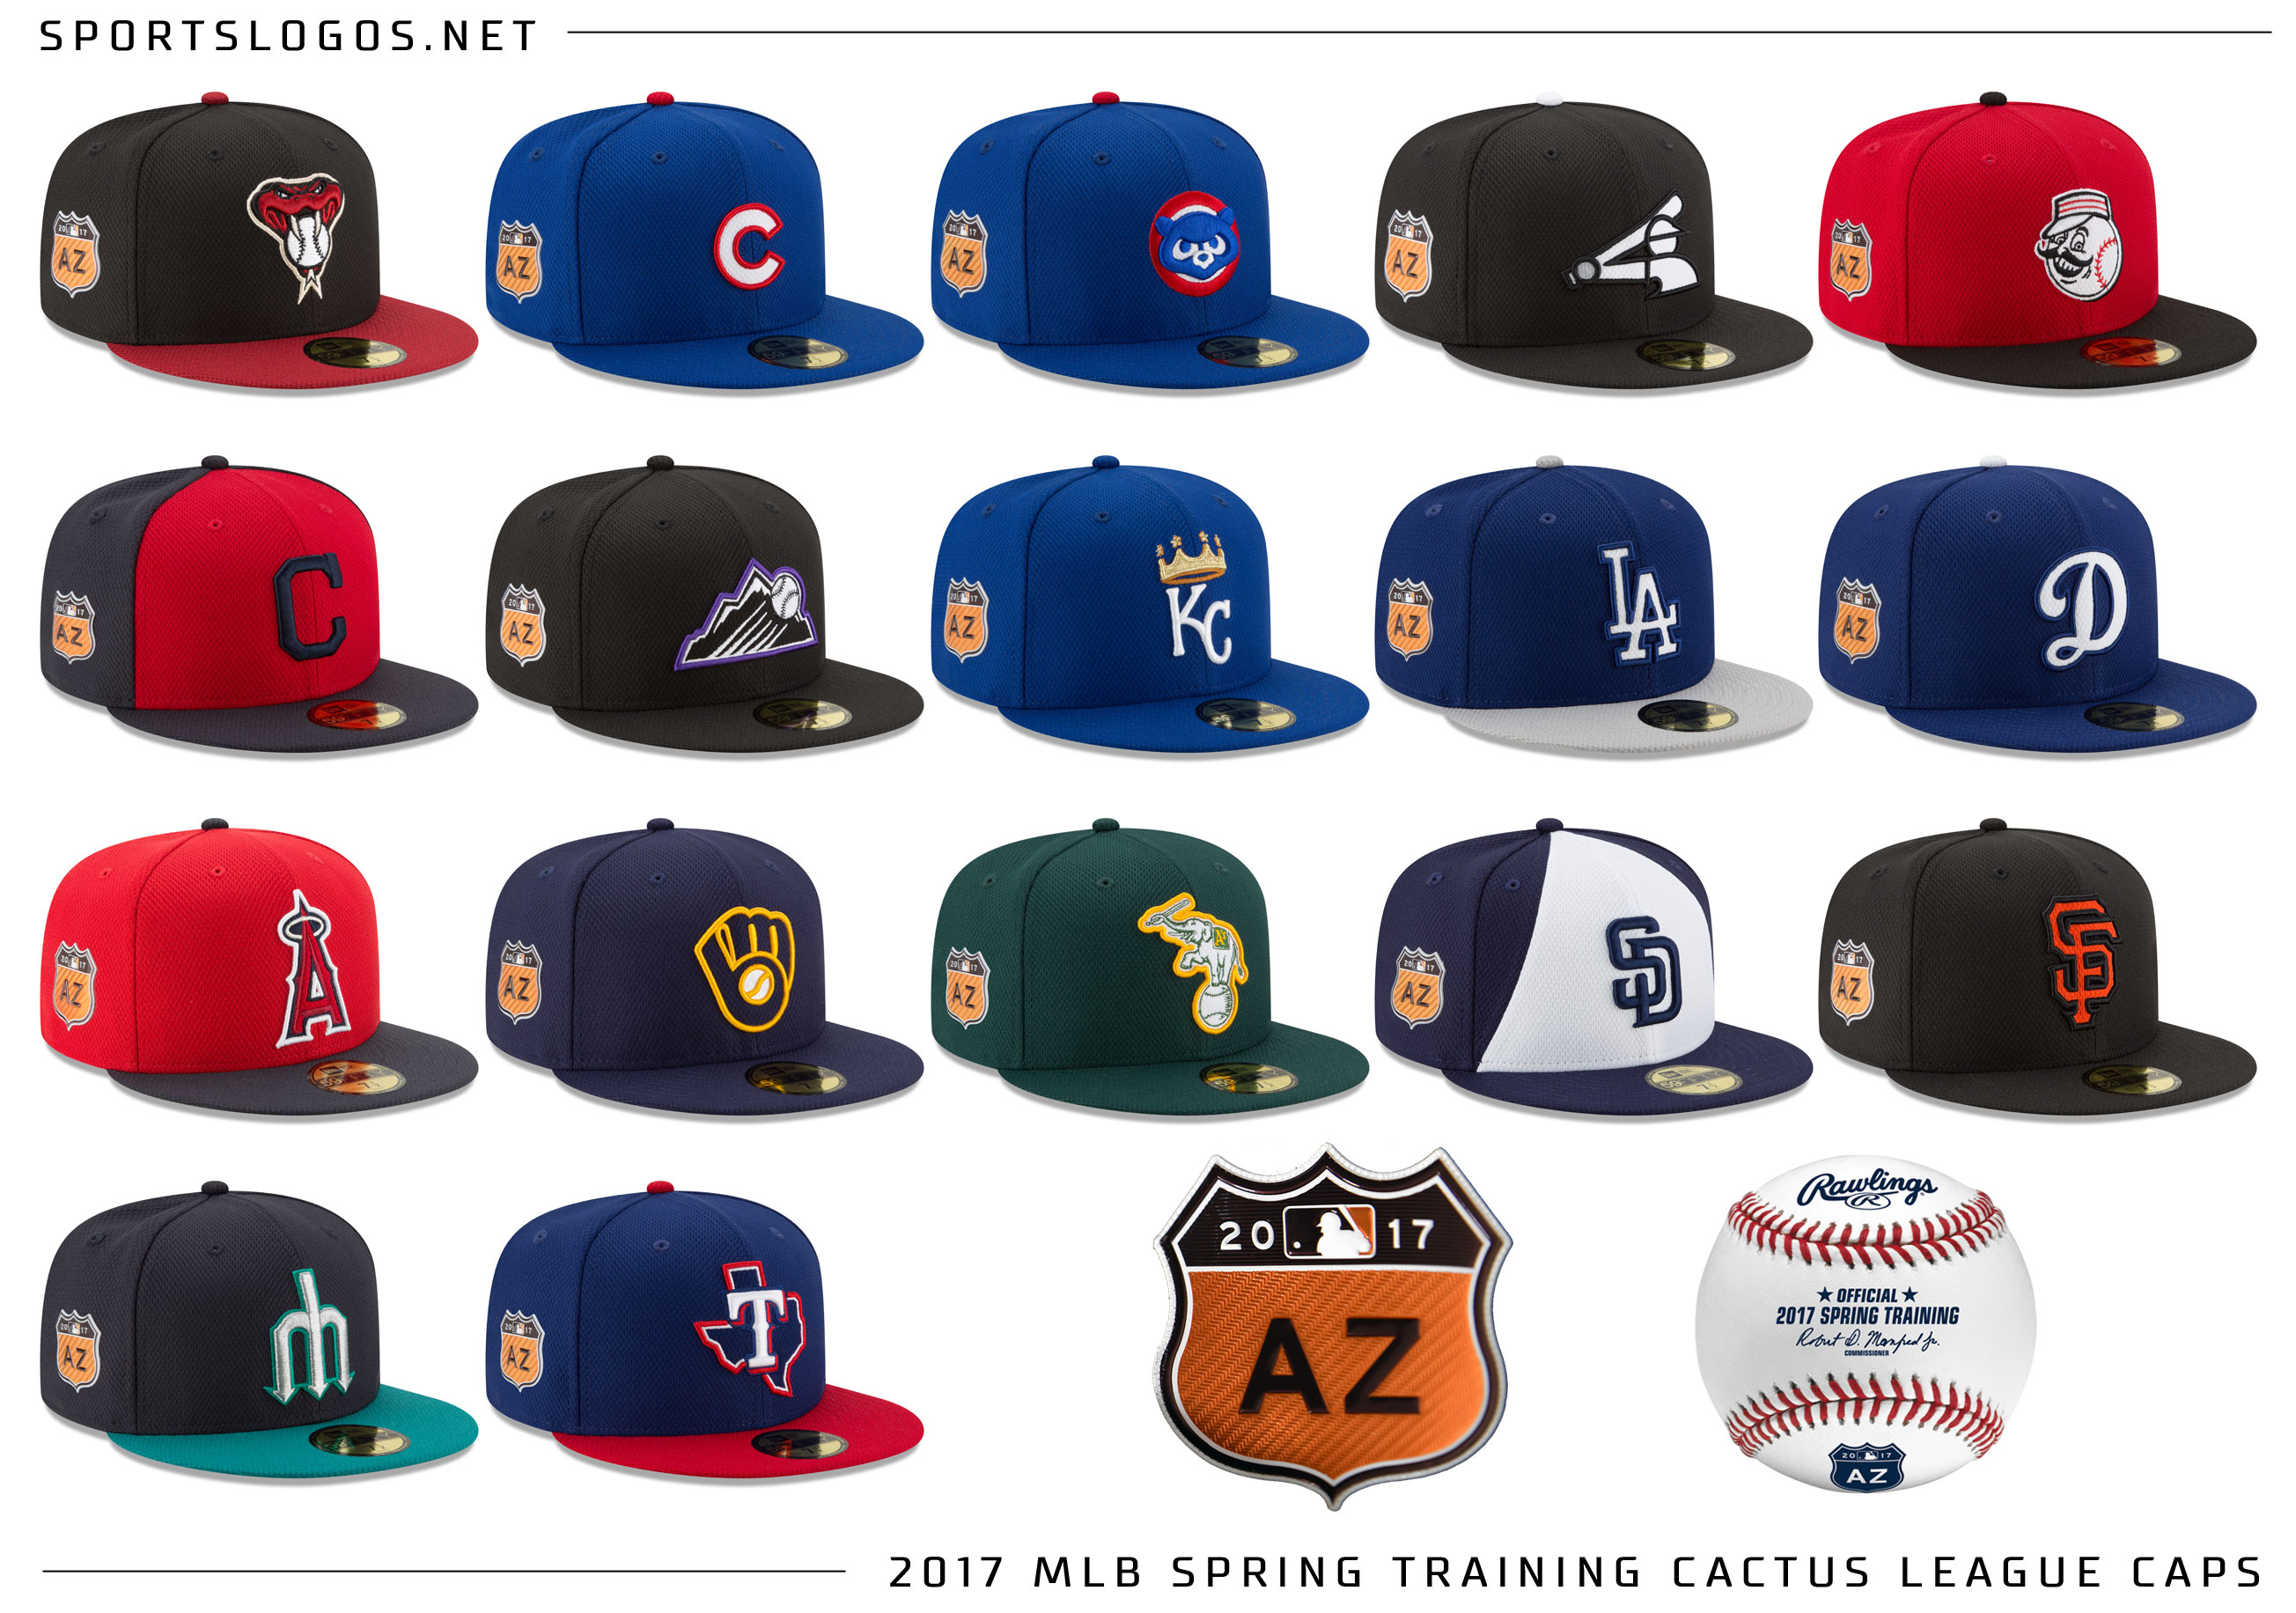 e35bcdb5d7ec3 MLB Unveils 2017 Spring Training Uniform Designs